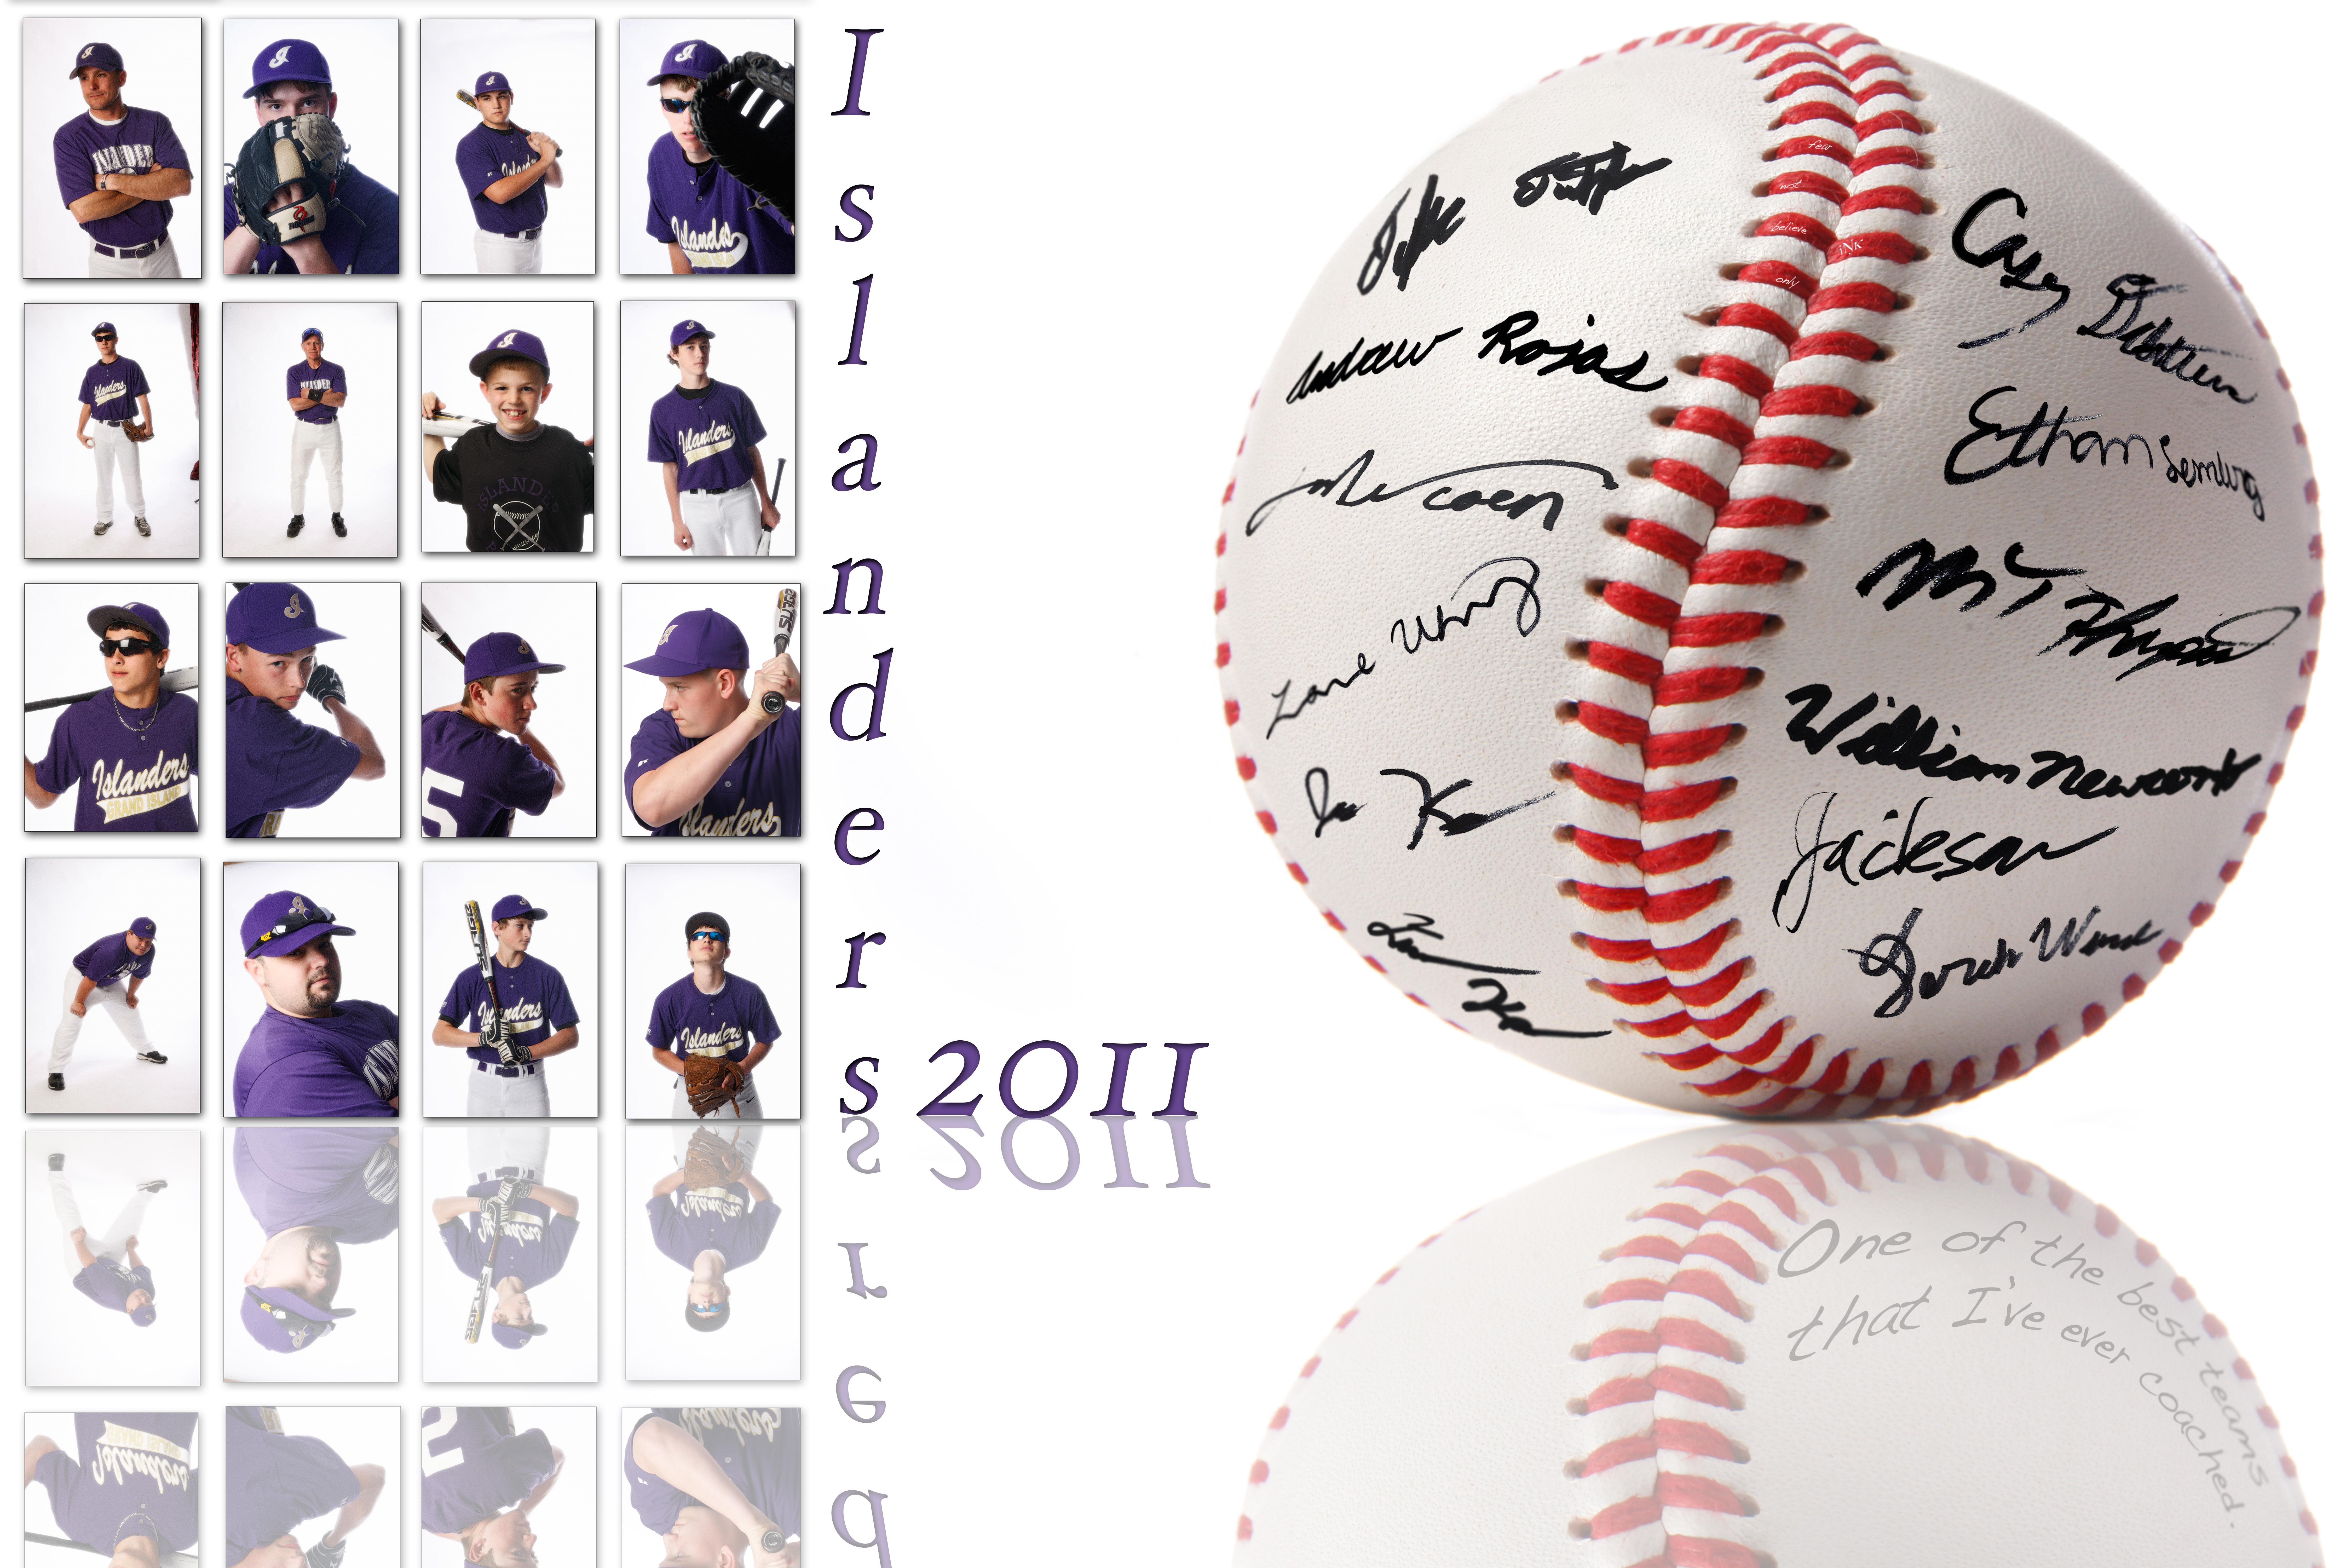 GISH_R_Baseball_Poster_2011(Hansen)